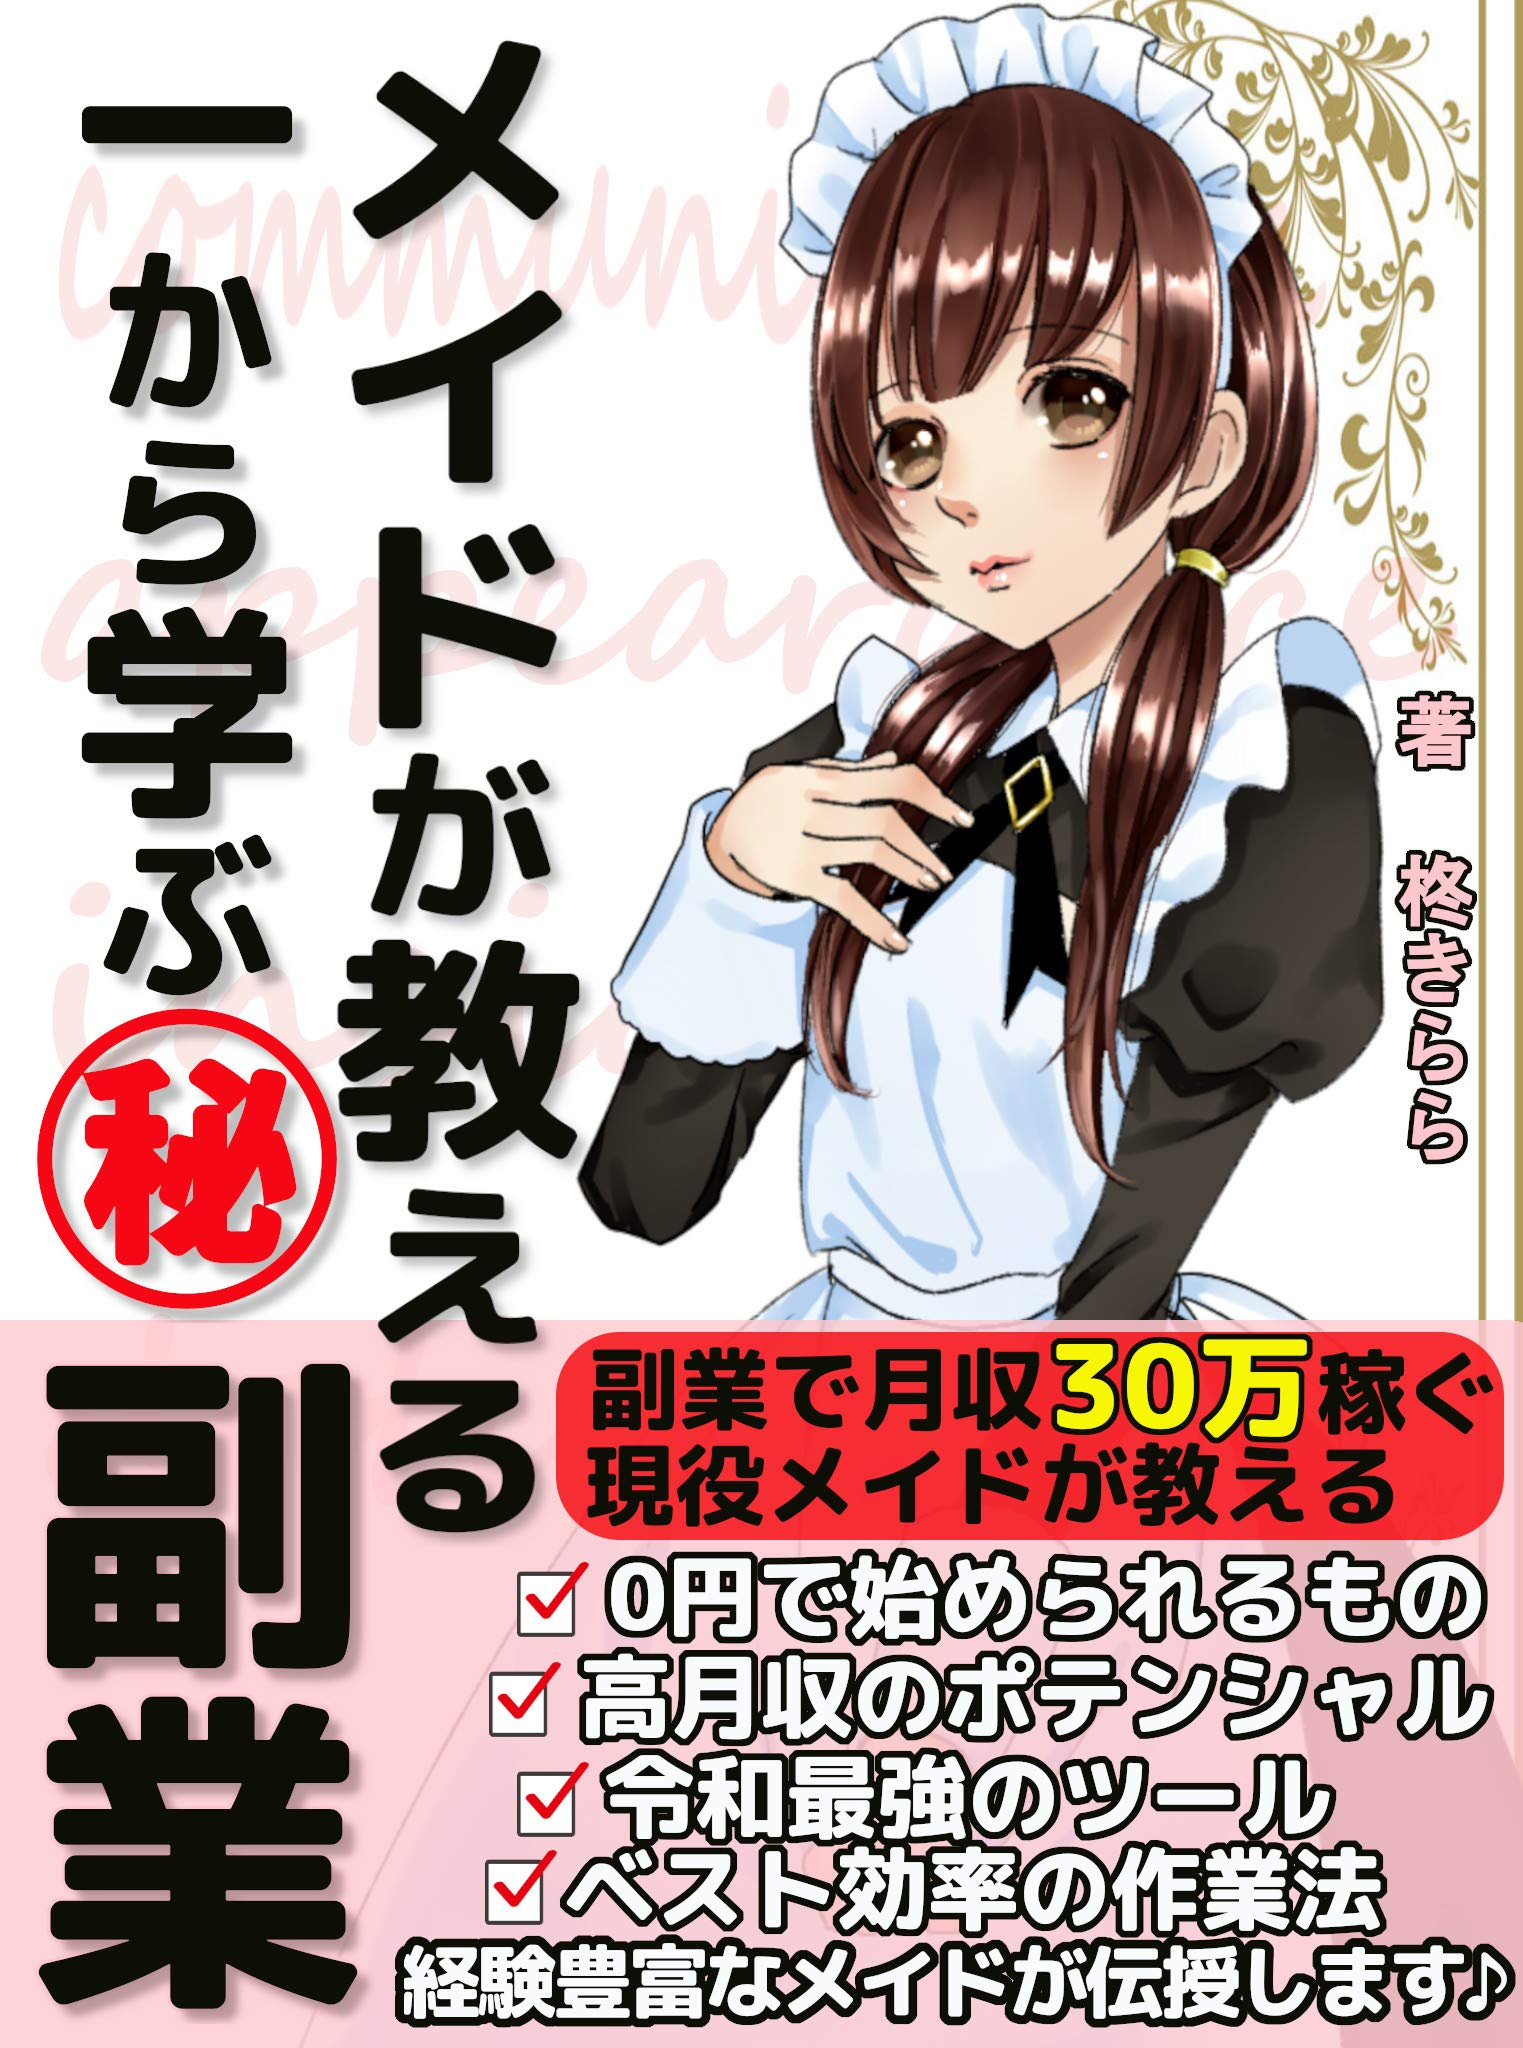 meidogaoshieruichikaramanabumaruhihukugyousaishinreiwanohukugyouzyutsukasegikatasyoshinsyaahuta-koronazaitakuwa-ku (Japanese Edition)